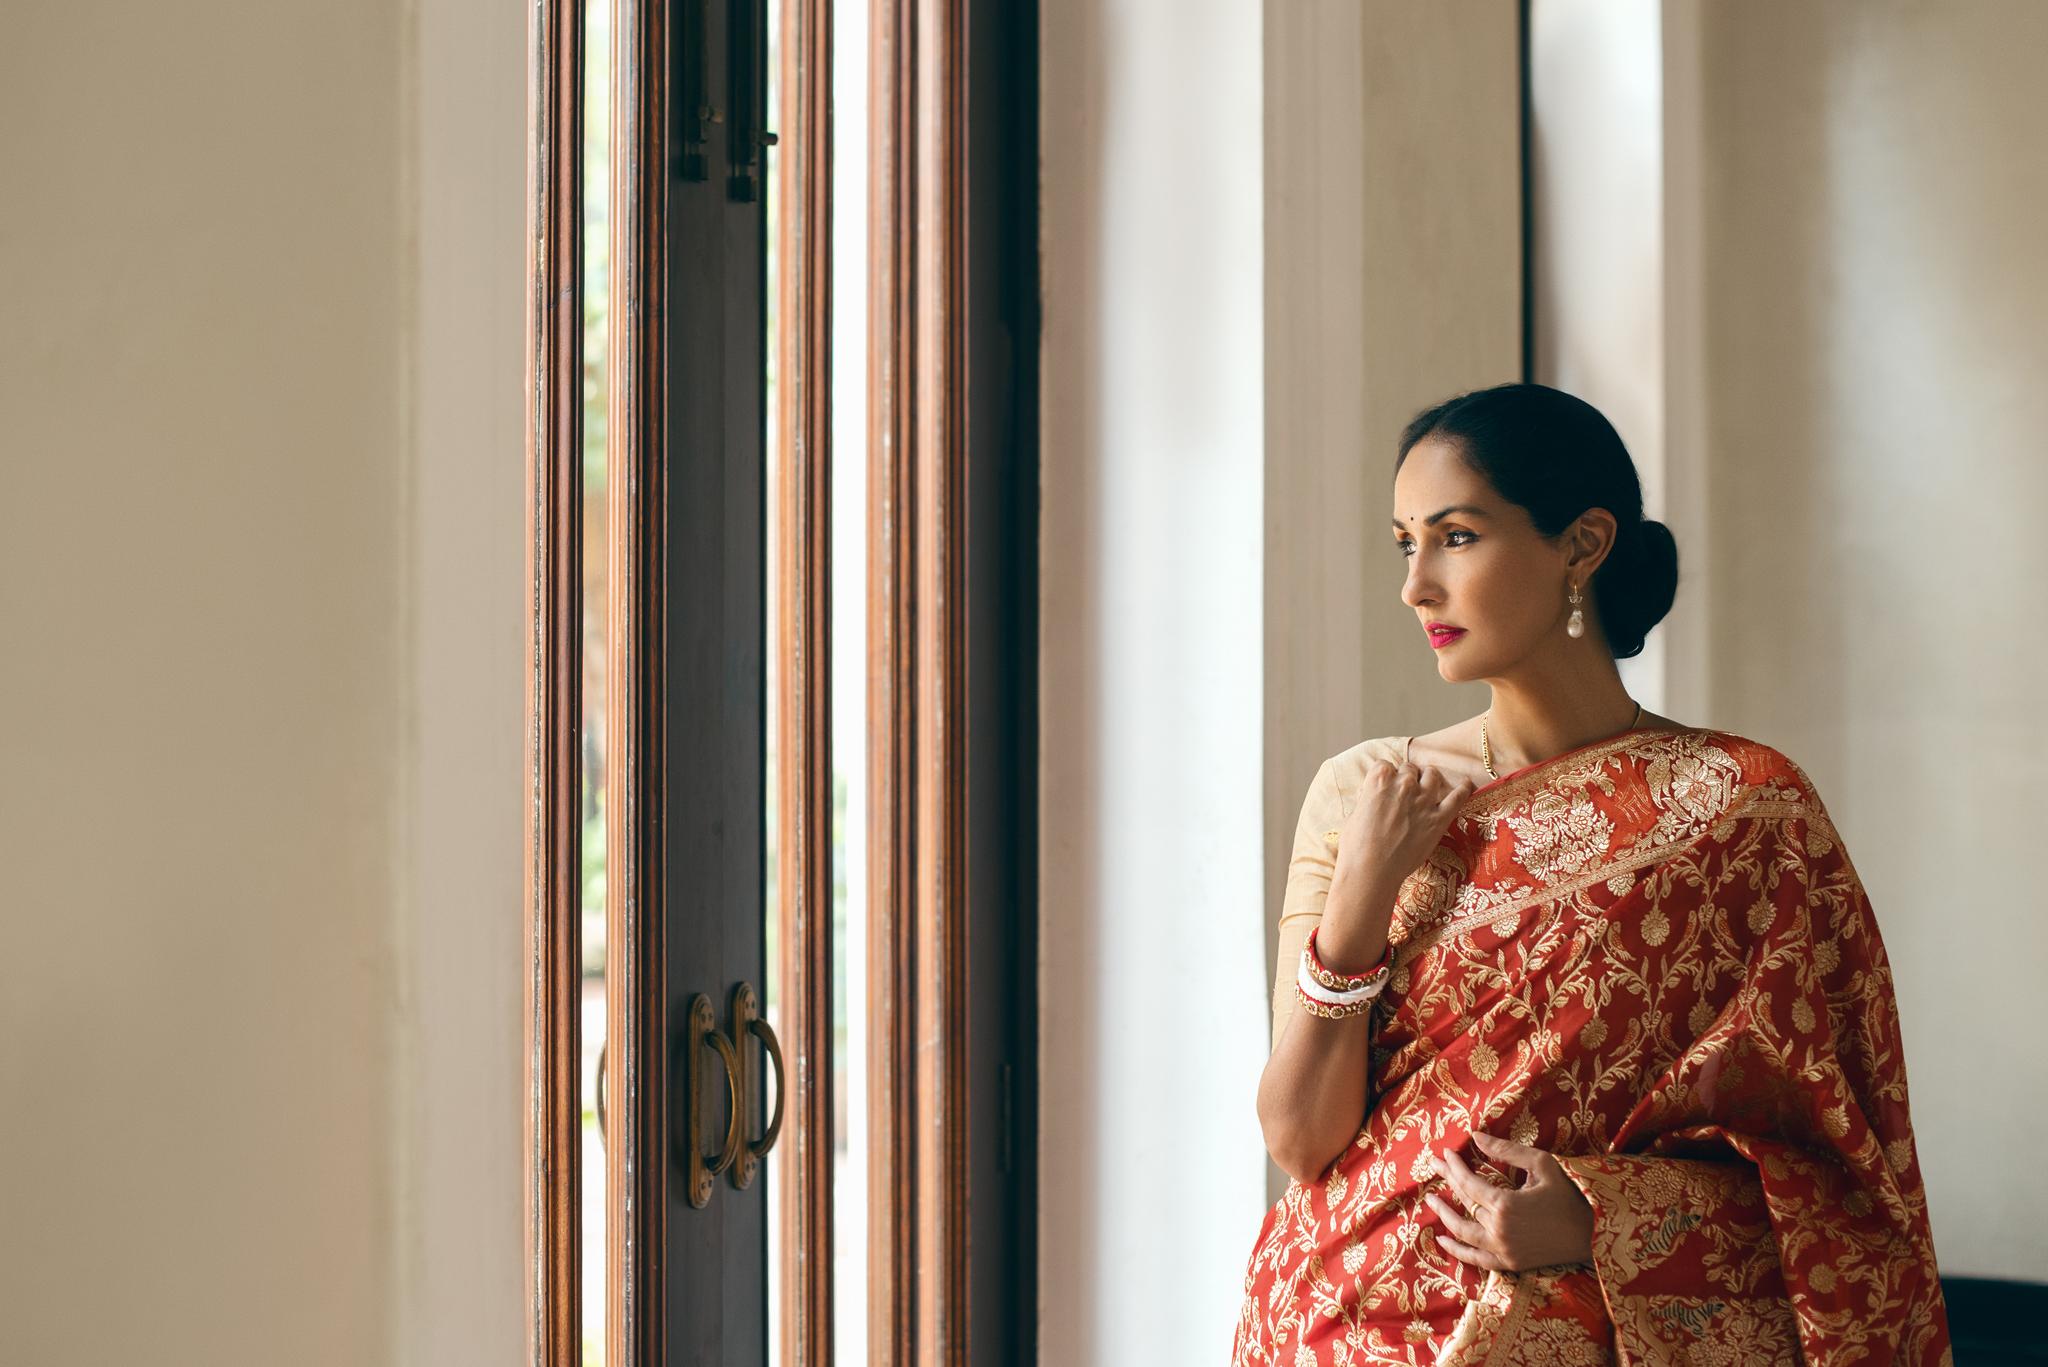 Simar Dugal Portrait Fashion Aditya Mendiratta